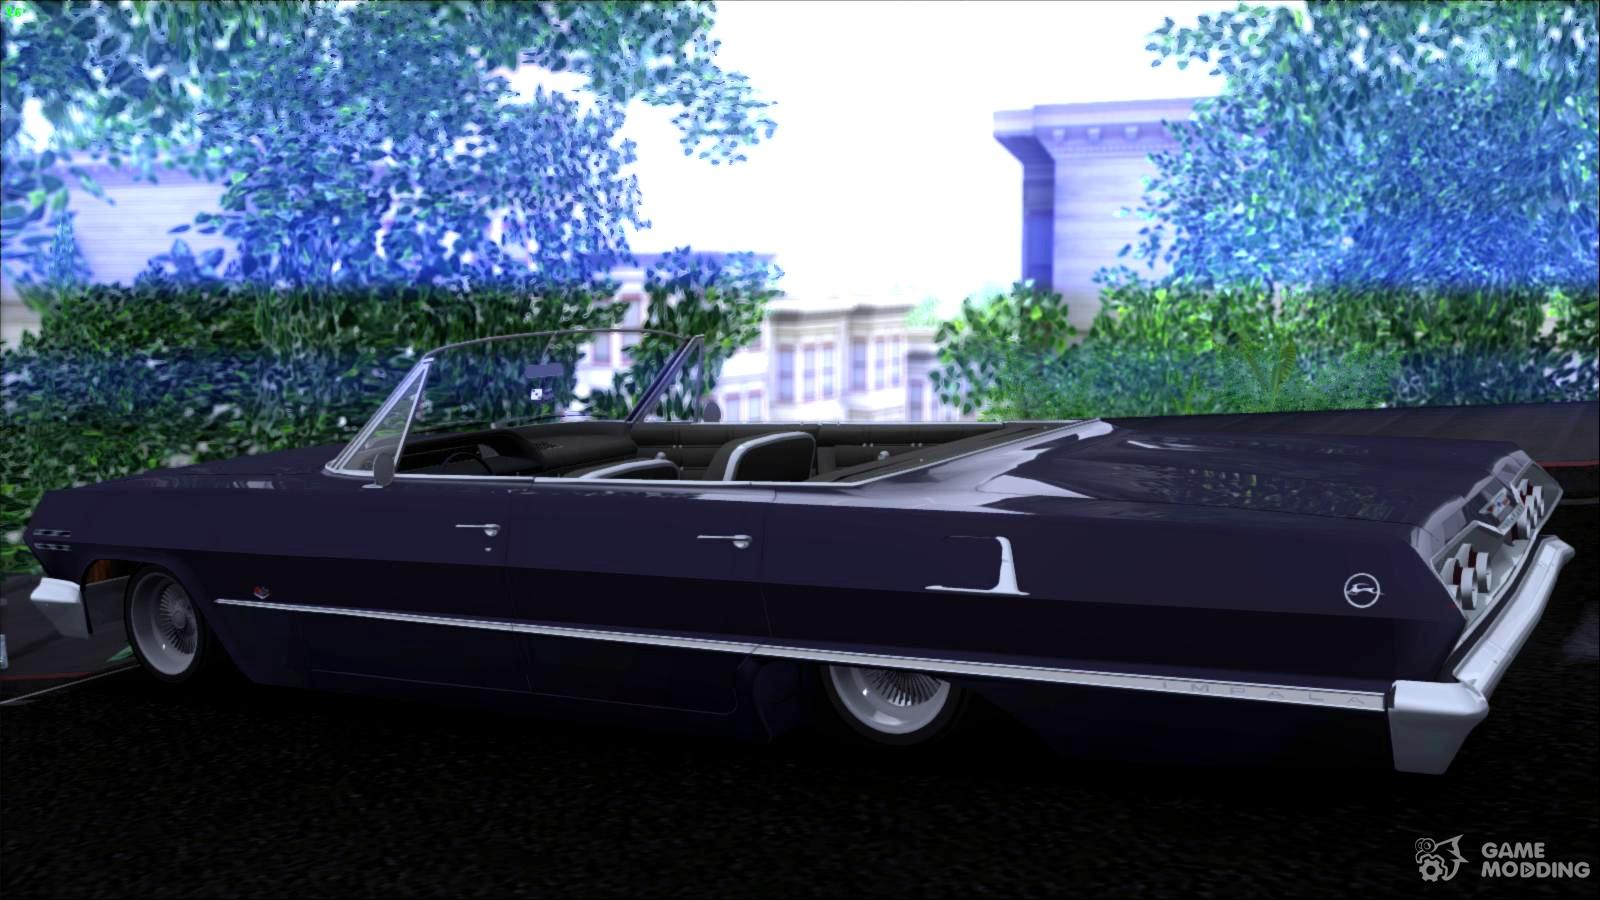 Chevrolet impala 4 door hardtop 1963 for gta san andreas - Chevrolet Impala 1963 For Gta San Andreas Top View